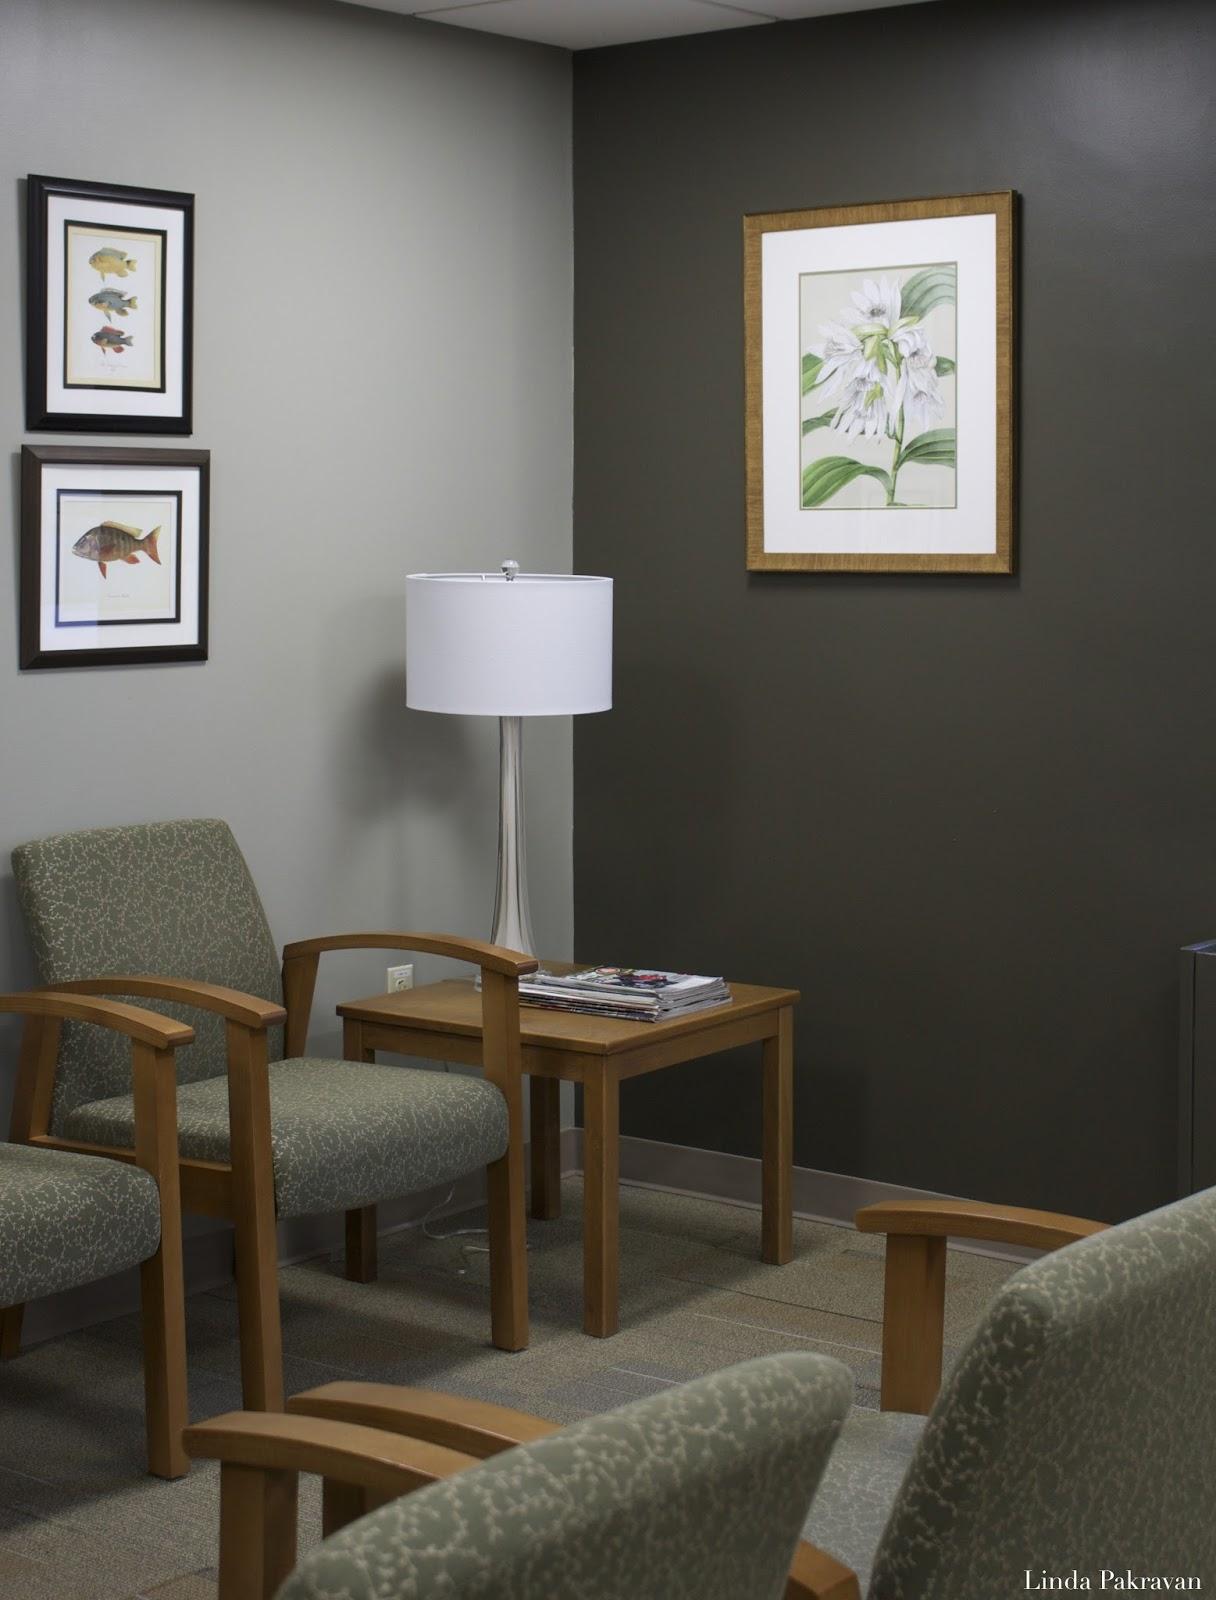 Waiting Room Design Ideas: A Design Snack By Linda Pakravan: A Quick Fix Waiting Room